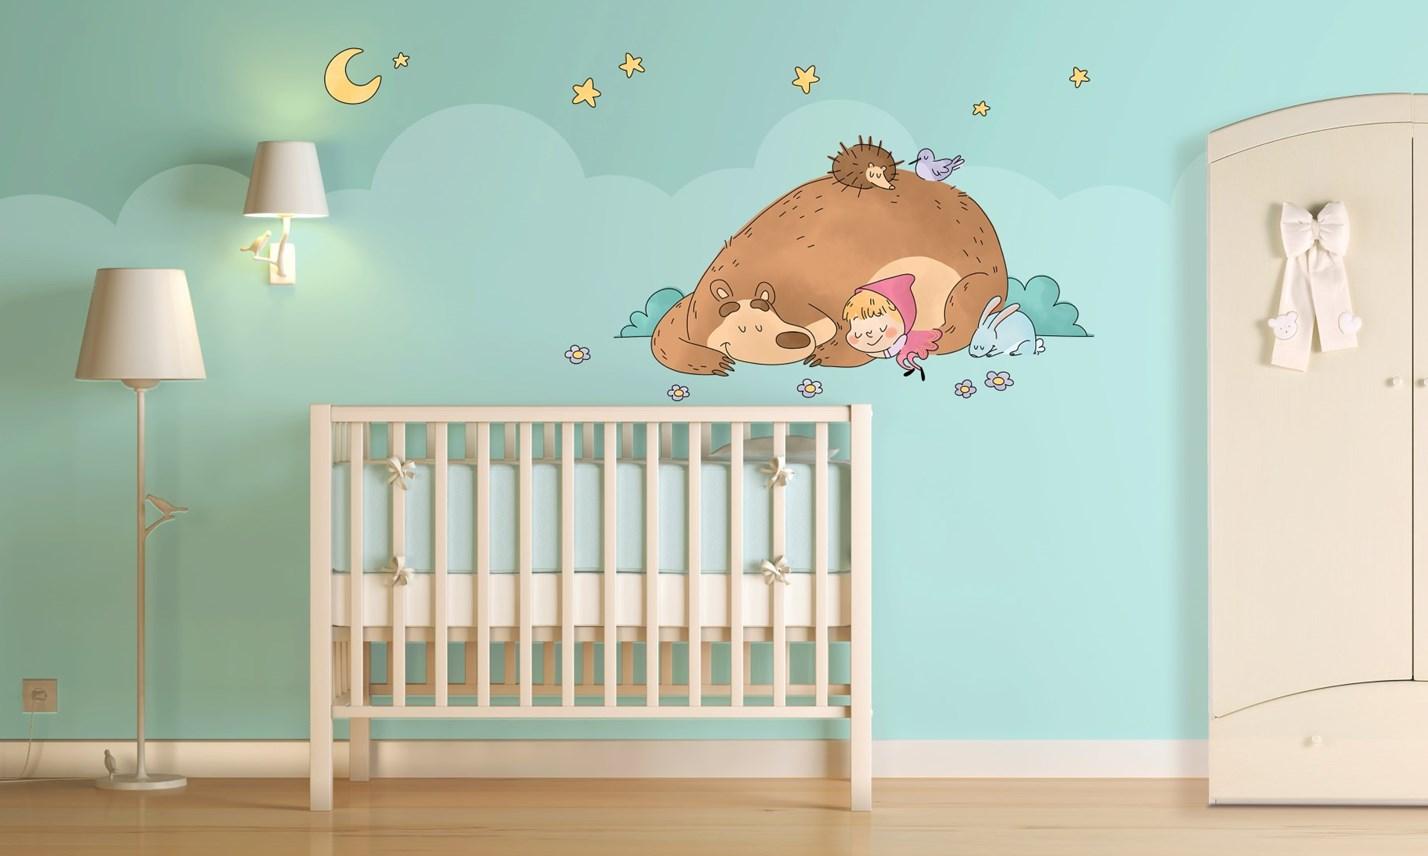 Decorazioni Per Camerette Per Bambini : Stencil da muro per camerette cheap adesivi murali per cameretta